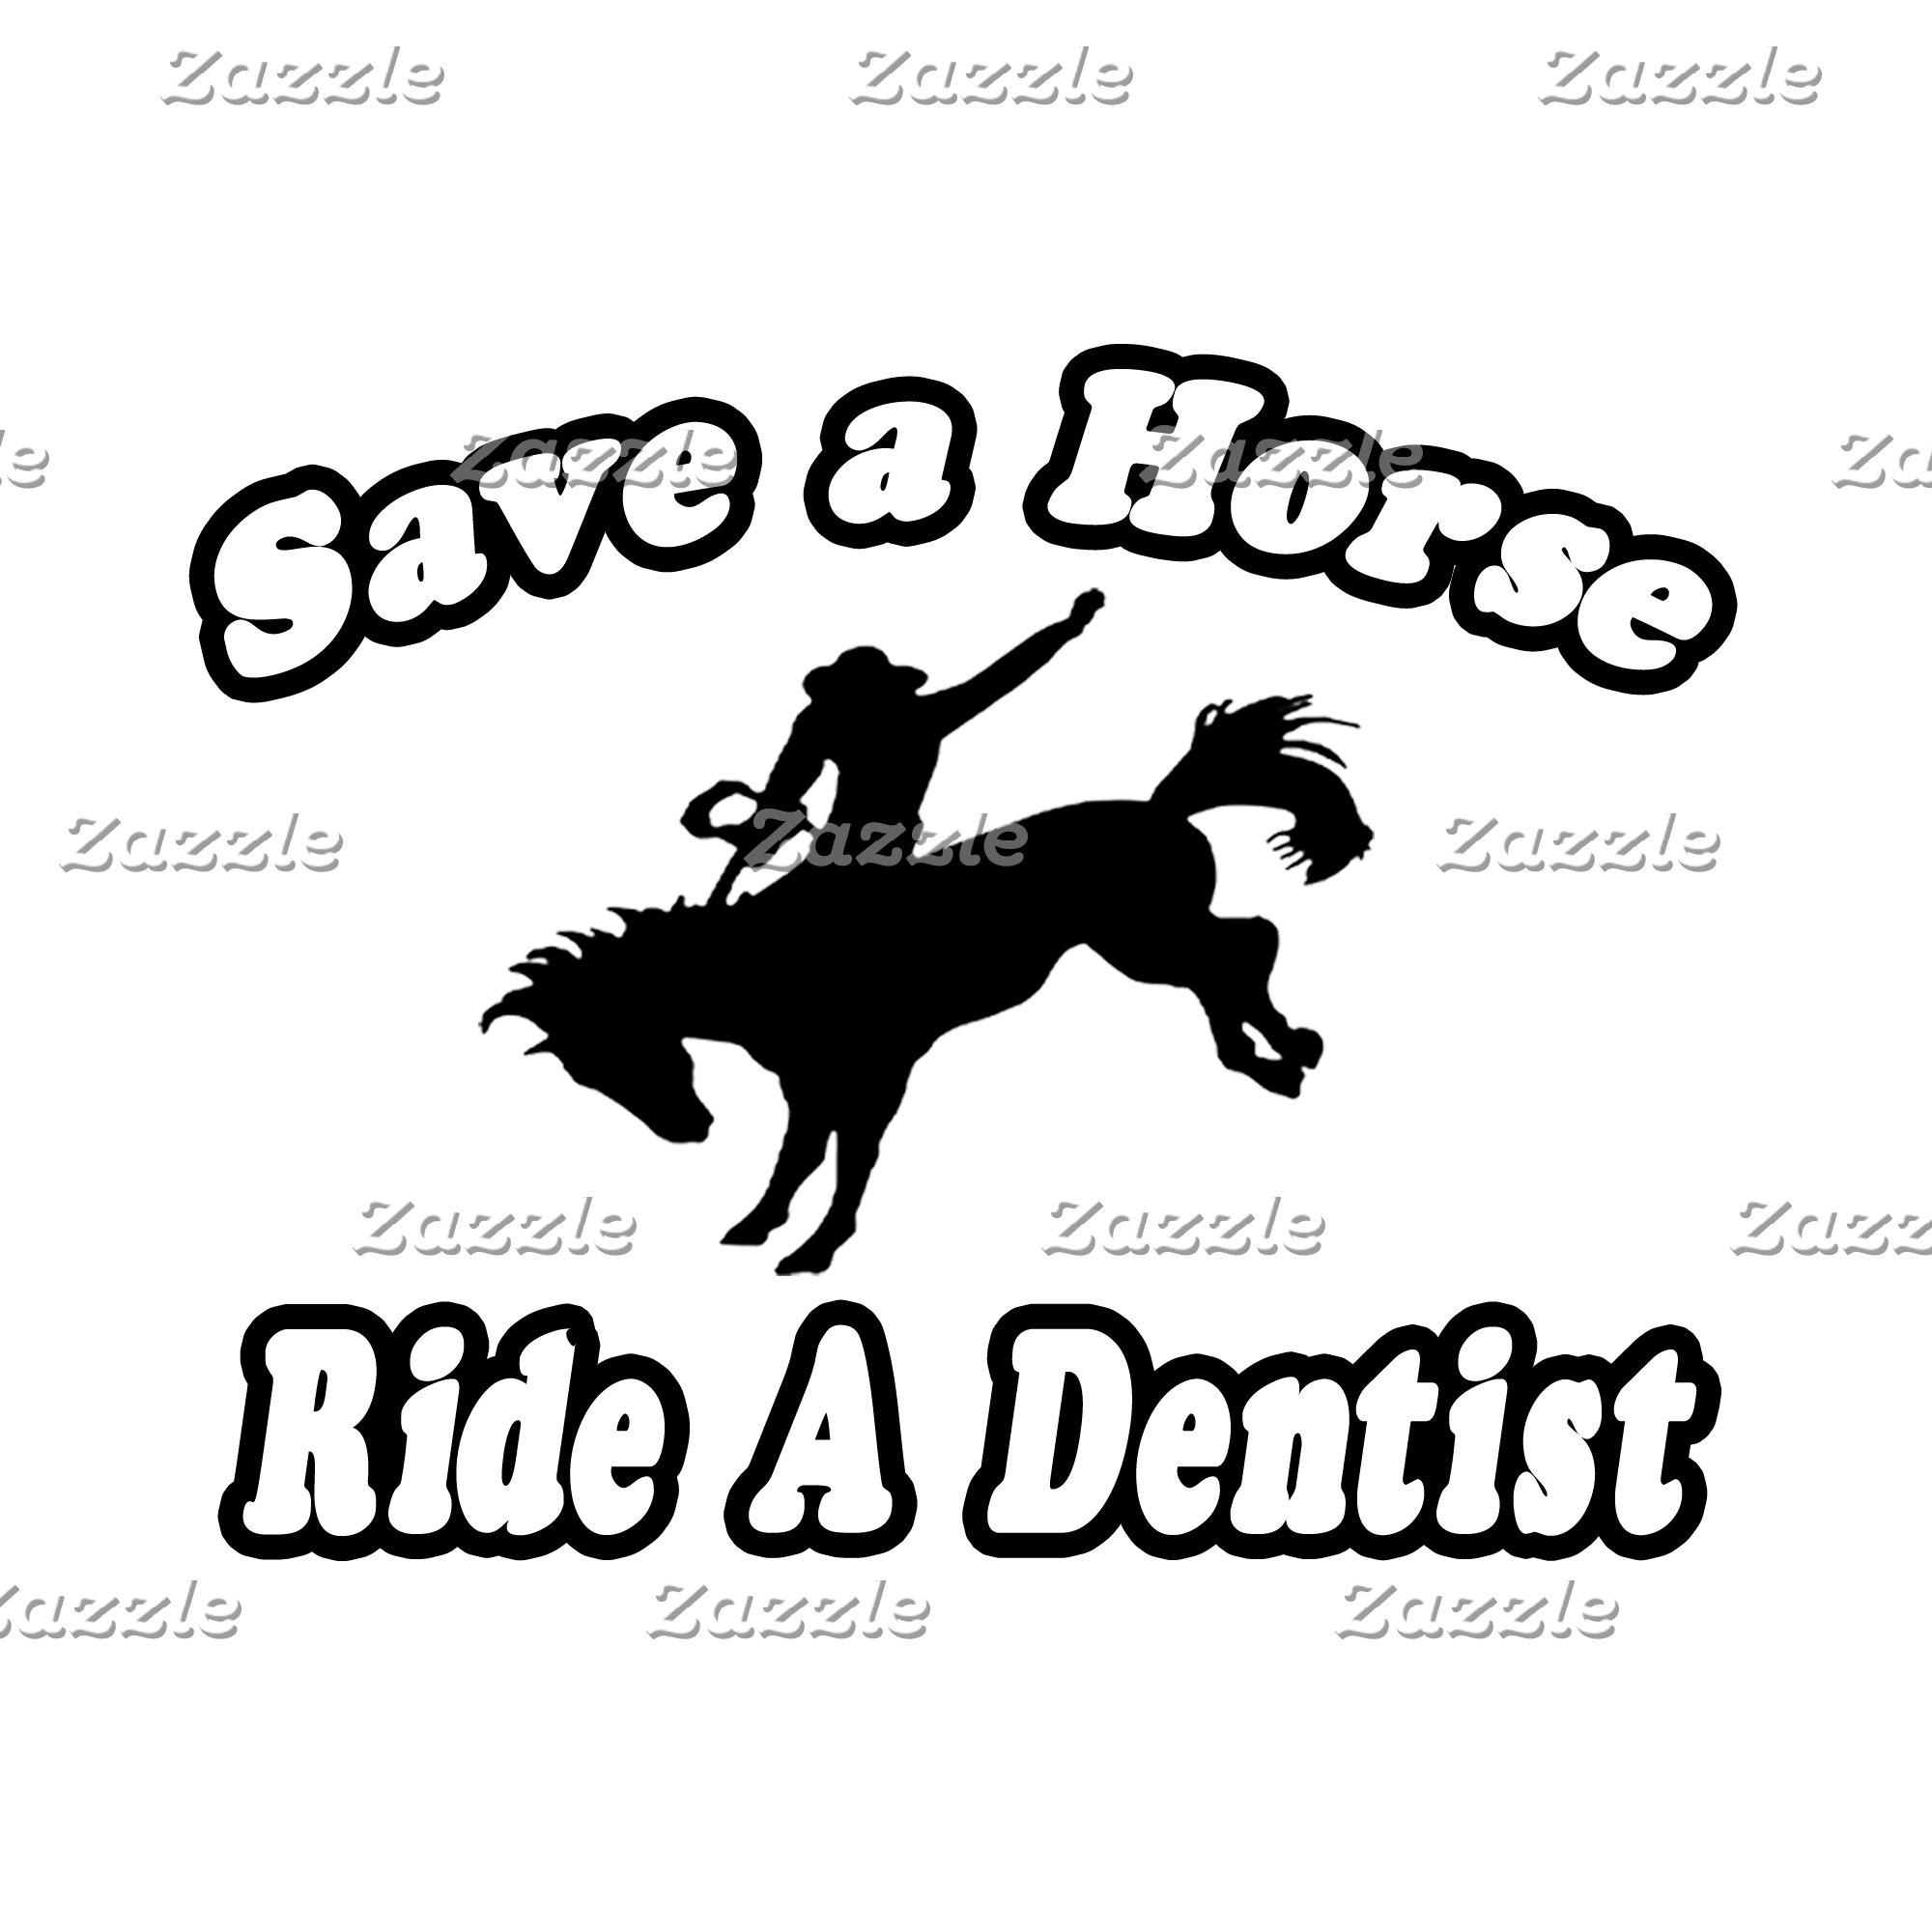 Save Horse, Ride Dentist